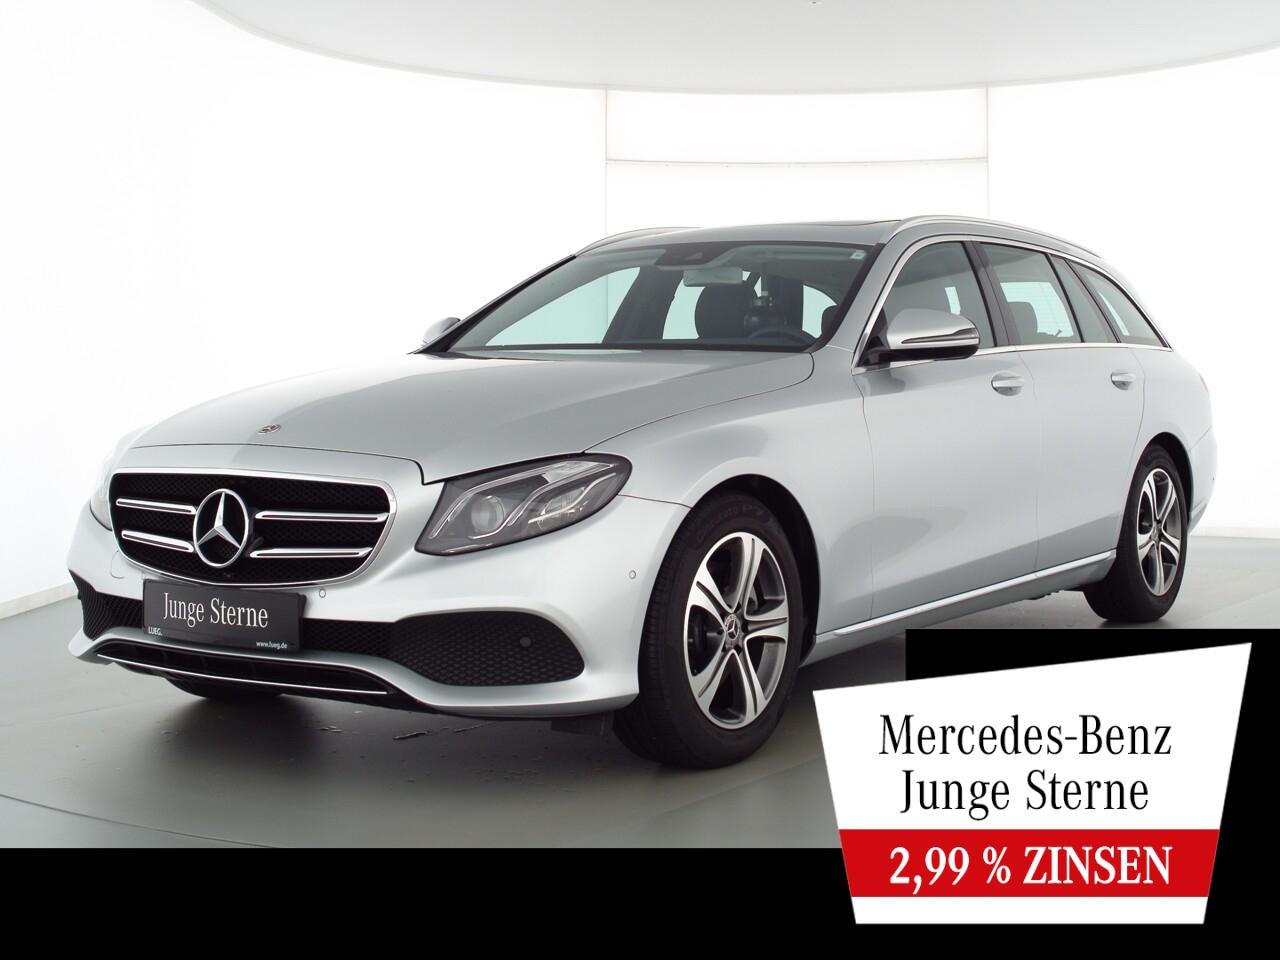 Mercedes-Benz E 200 T Avantgarde+Nav+SHD+Mbeam+Totw+ParkAssist, Jahr 2019, Benzin